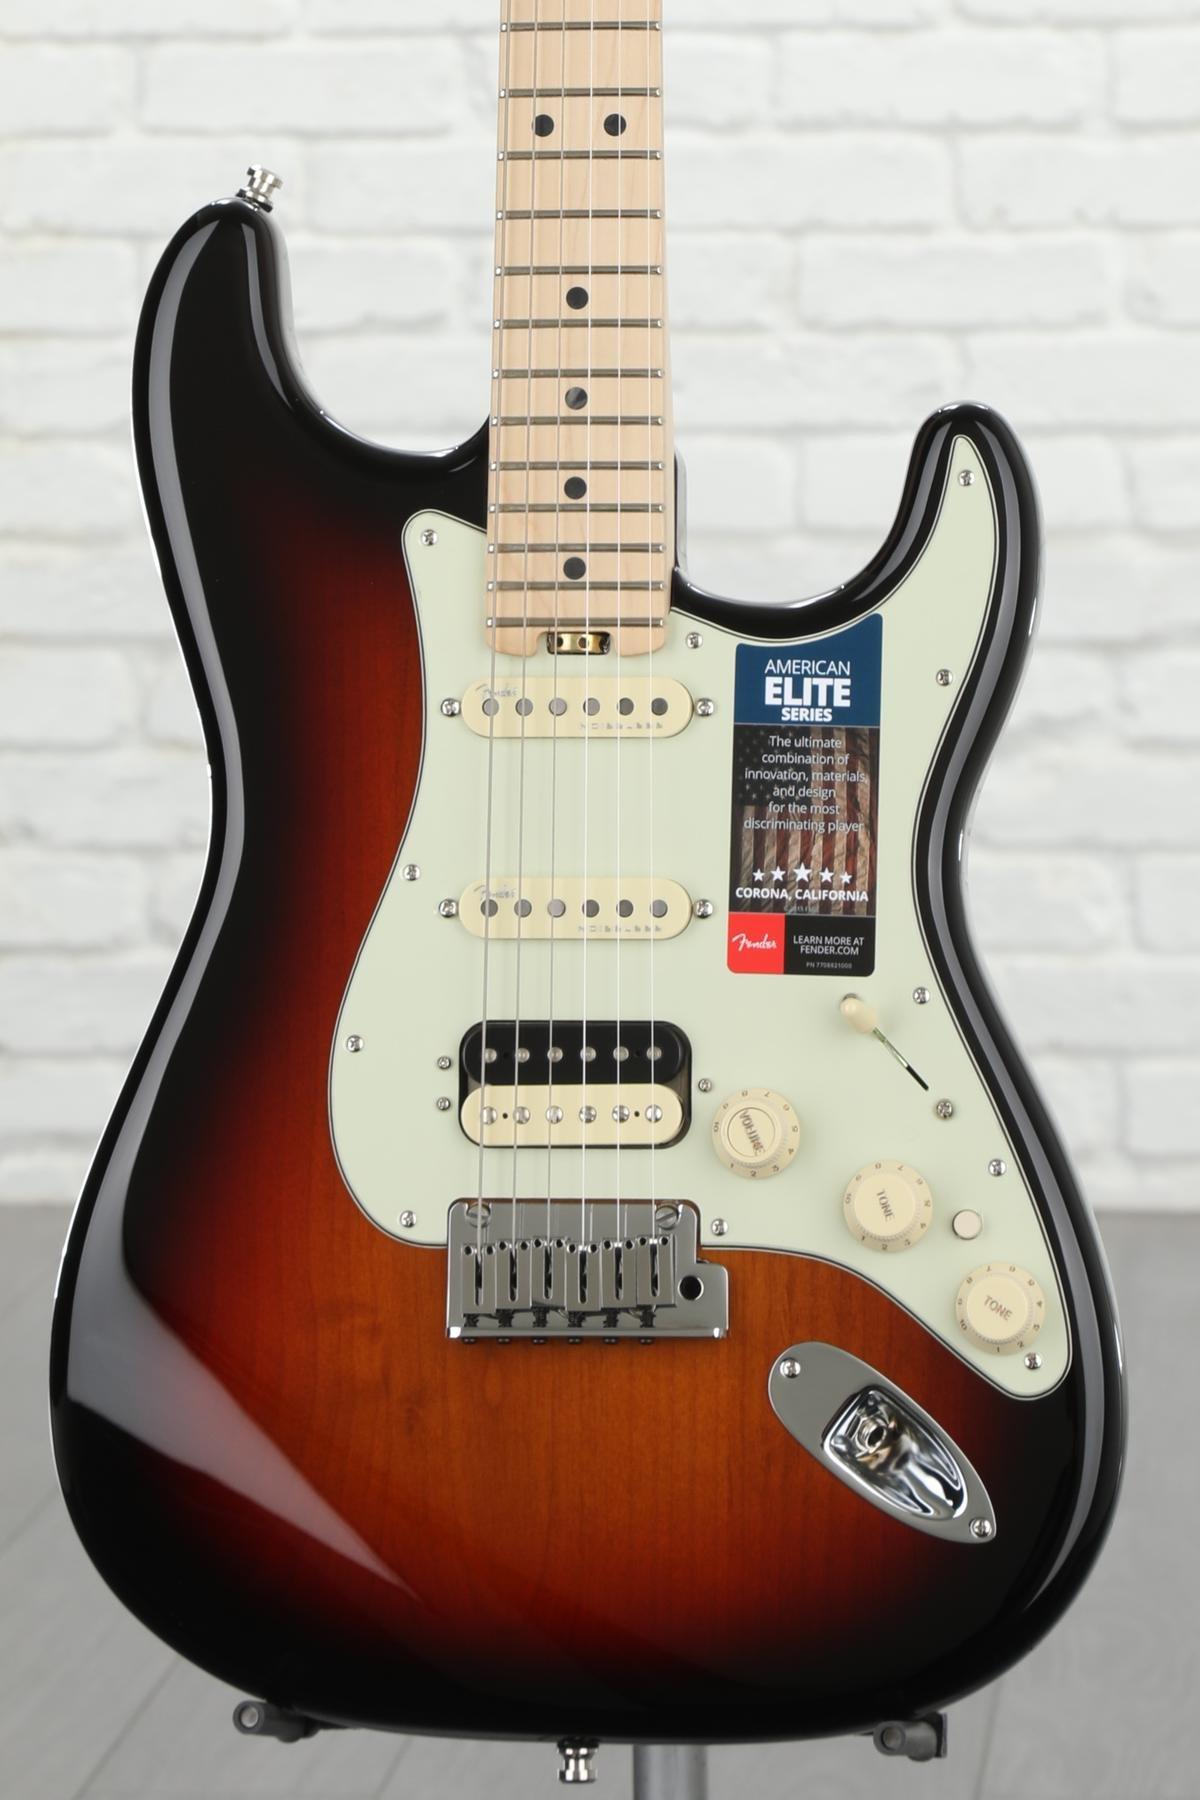 Fender American Elite Stratocaster Hss Shawbucker 3 Color Sunburst Single Coil Pickup Wiring Diagram As Well Guitar W Maple Fingerboard Image